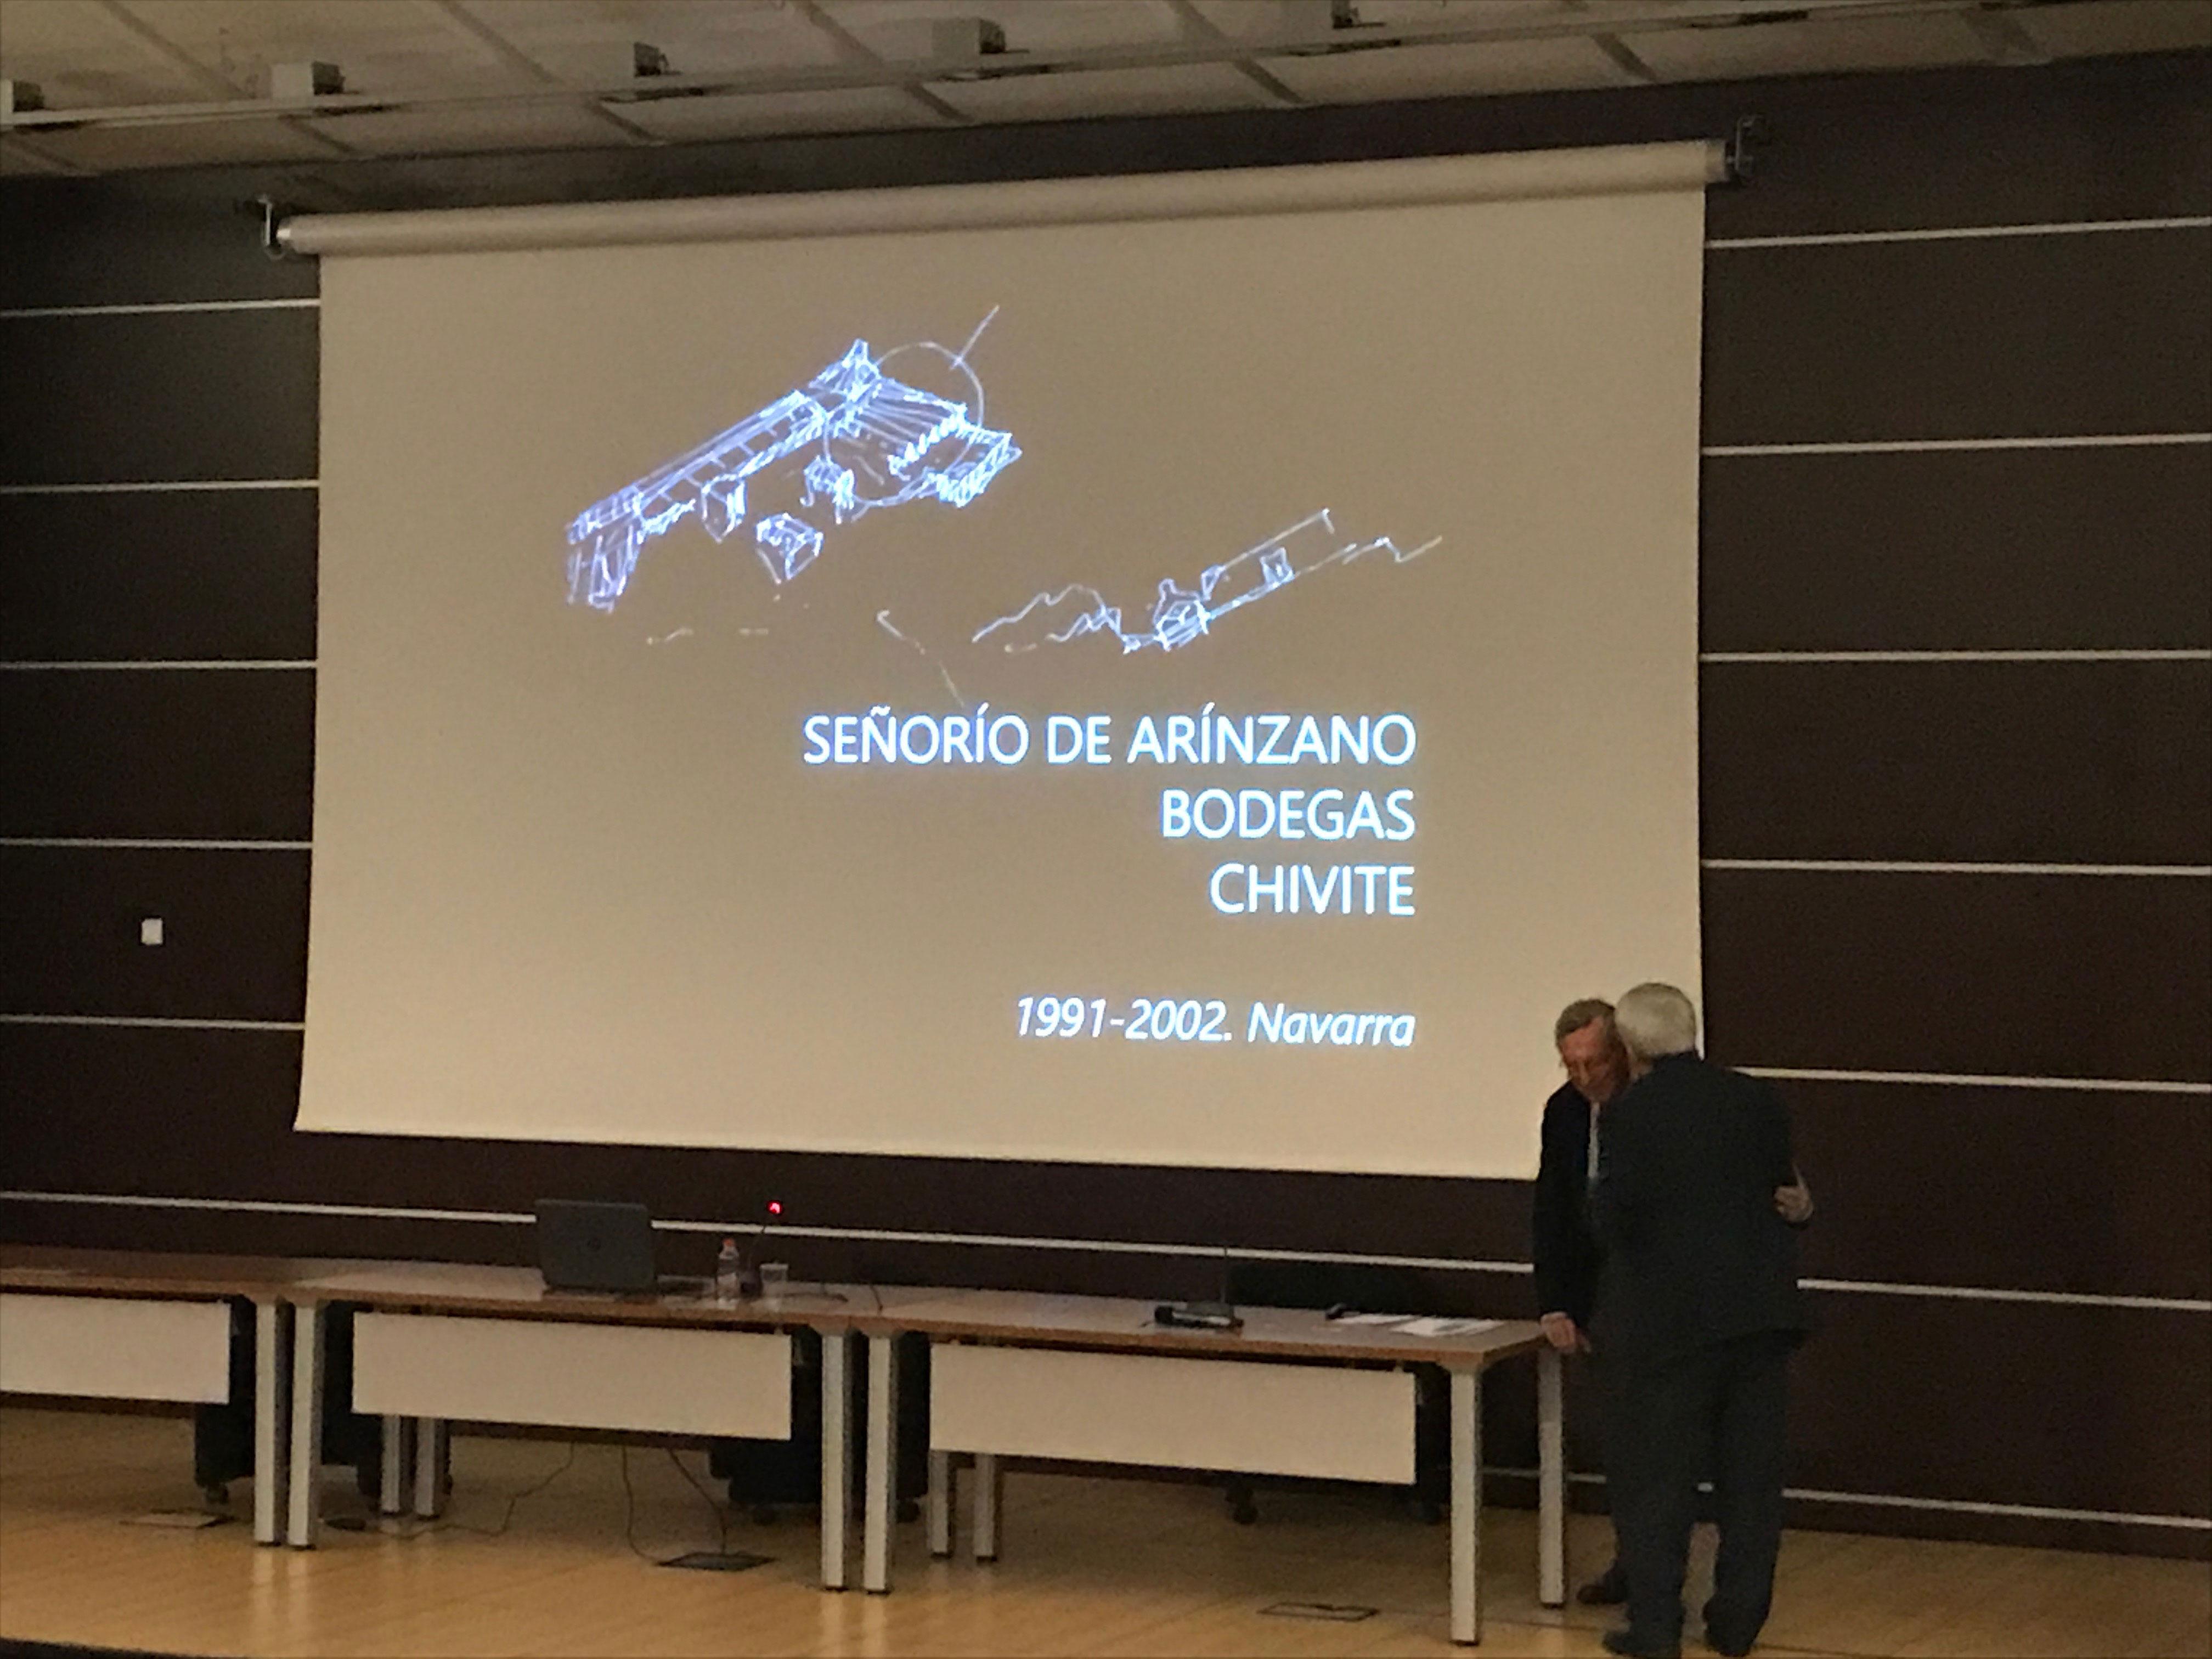 Rafael-Moneo-conferencia-foro-de-arquitectura-cevisama-2018-ceramica-a-mano-alzada